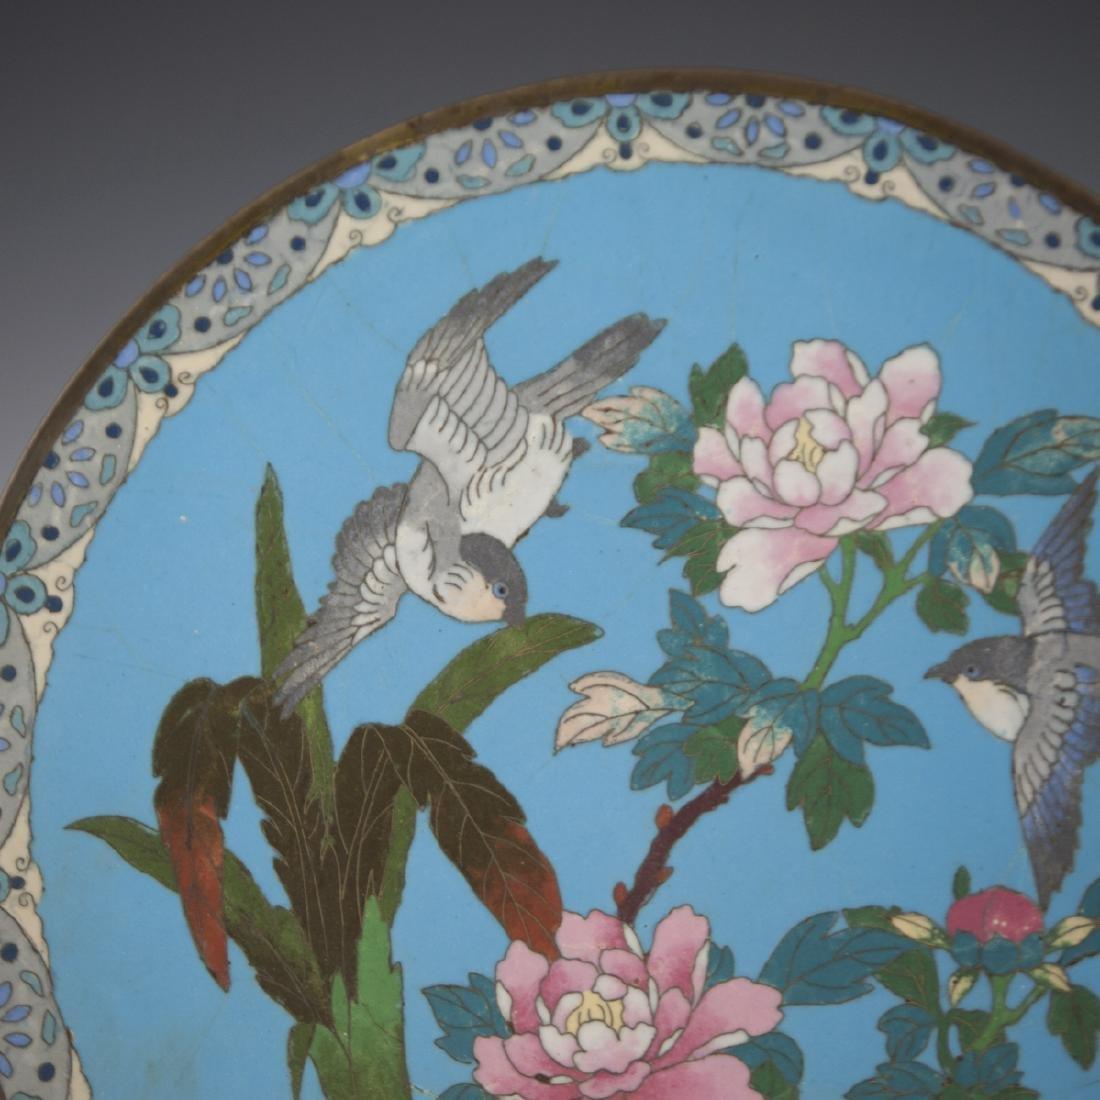 Antique Japanese Cloisonne Enameled Plate - 2